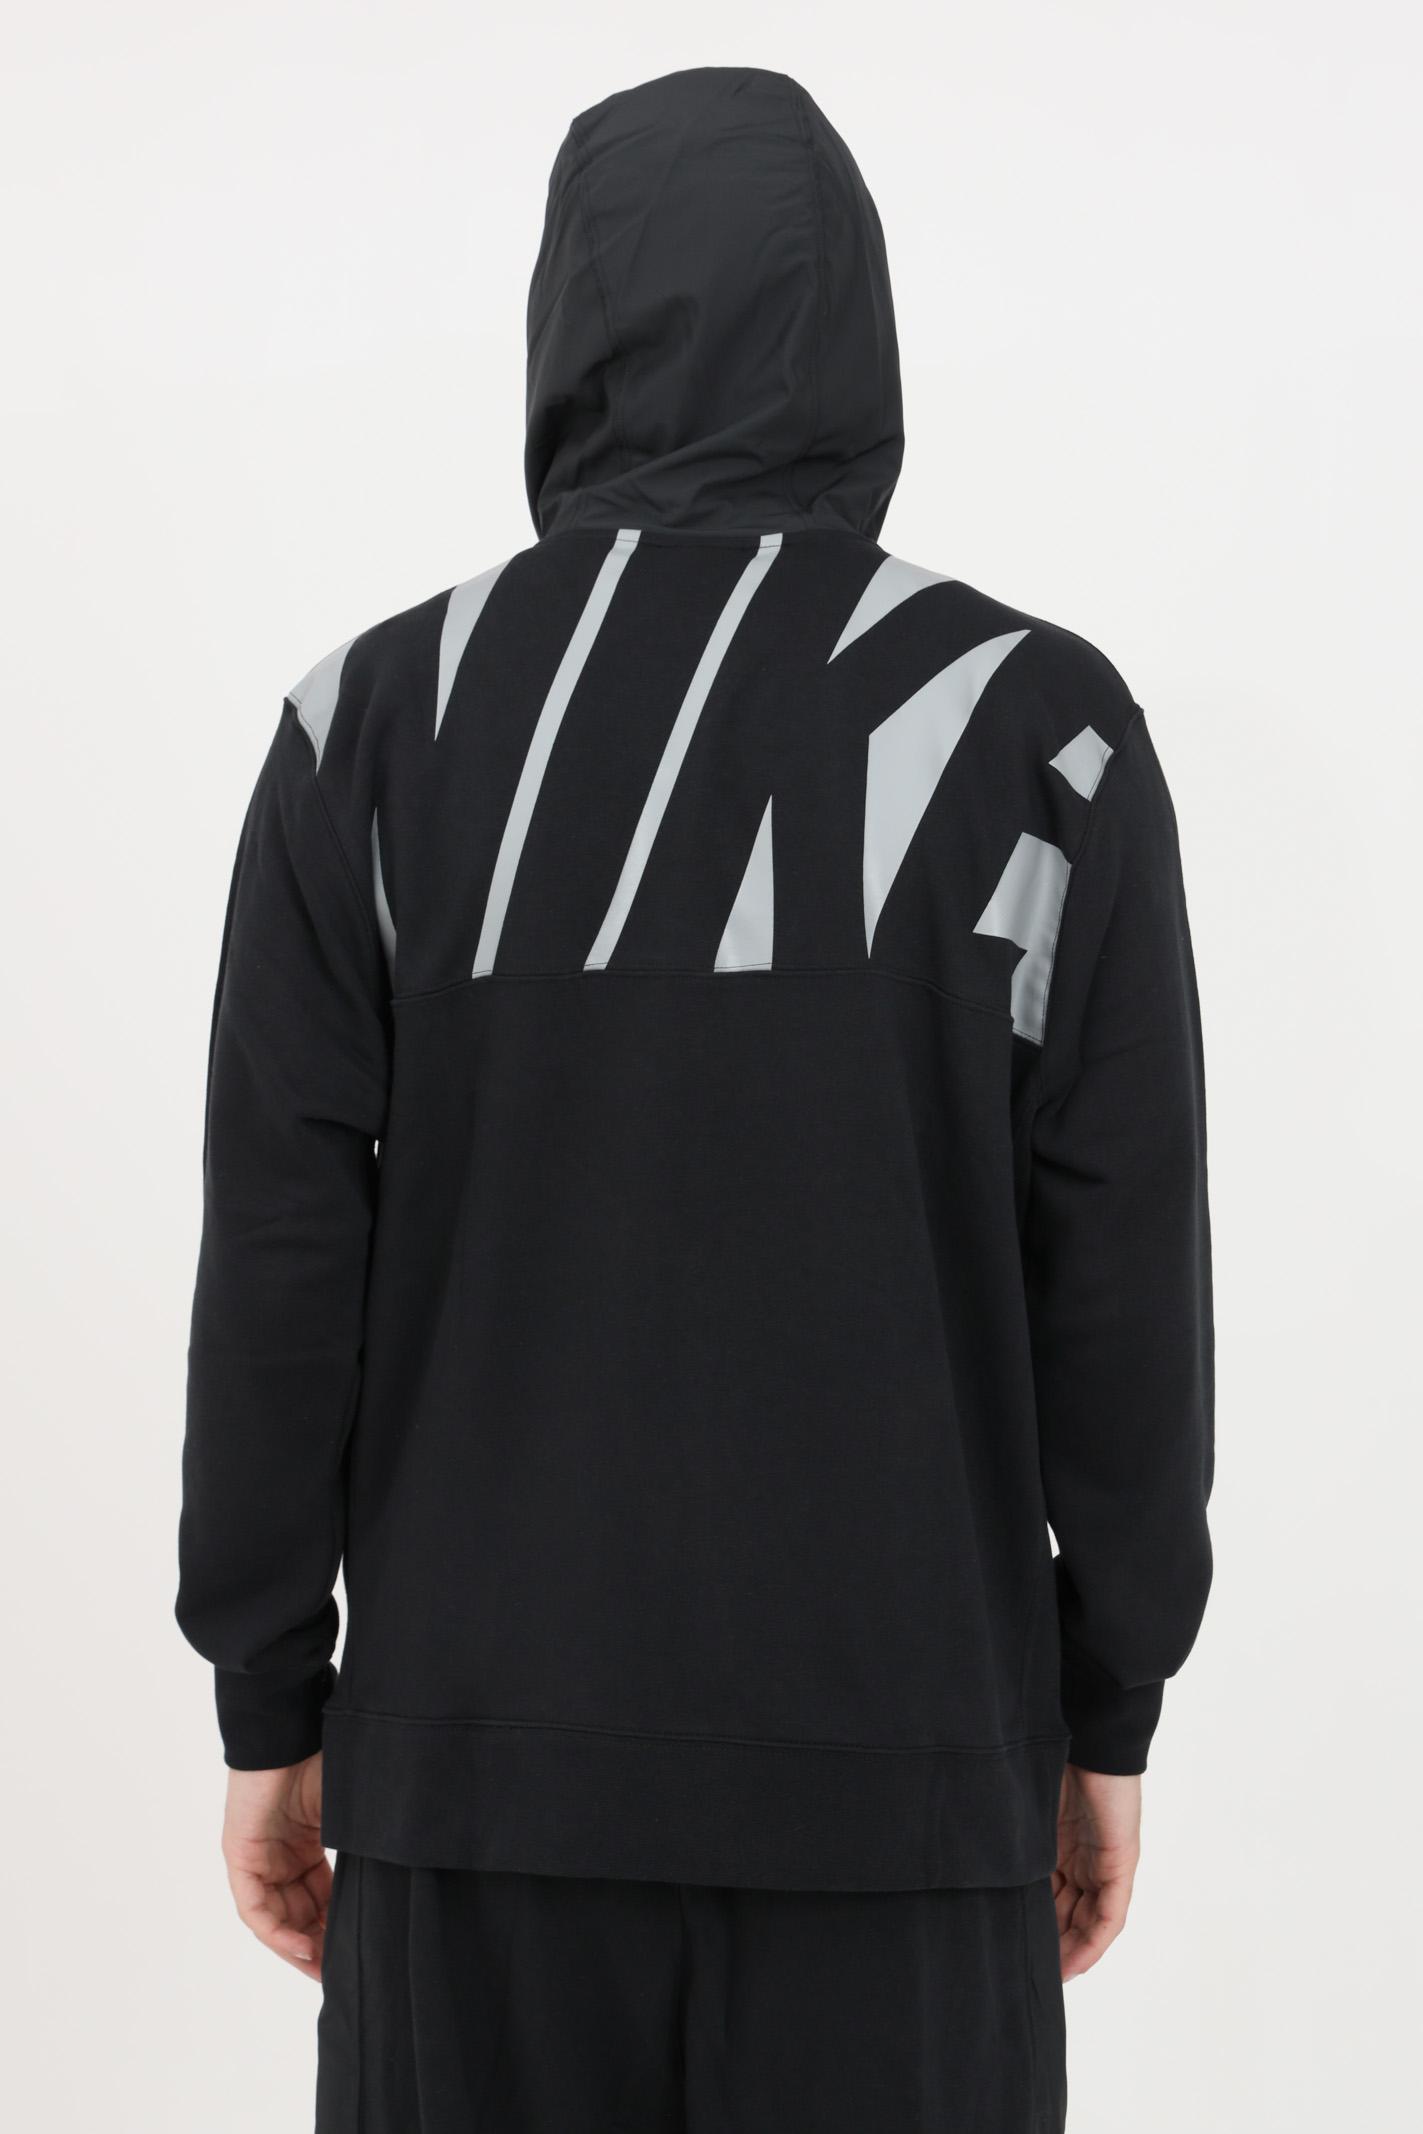 Felpa uomo nero nike con zip frontale NIKE | Felpe | CZ9944010